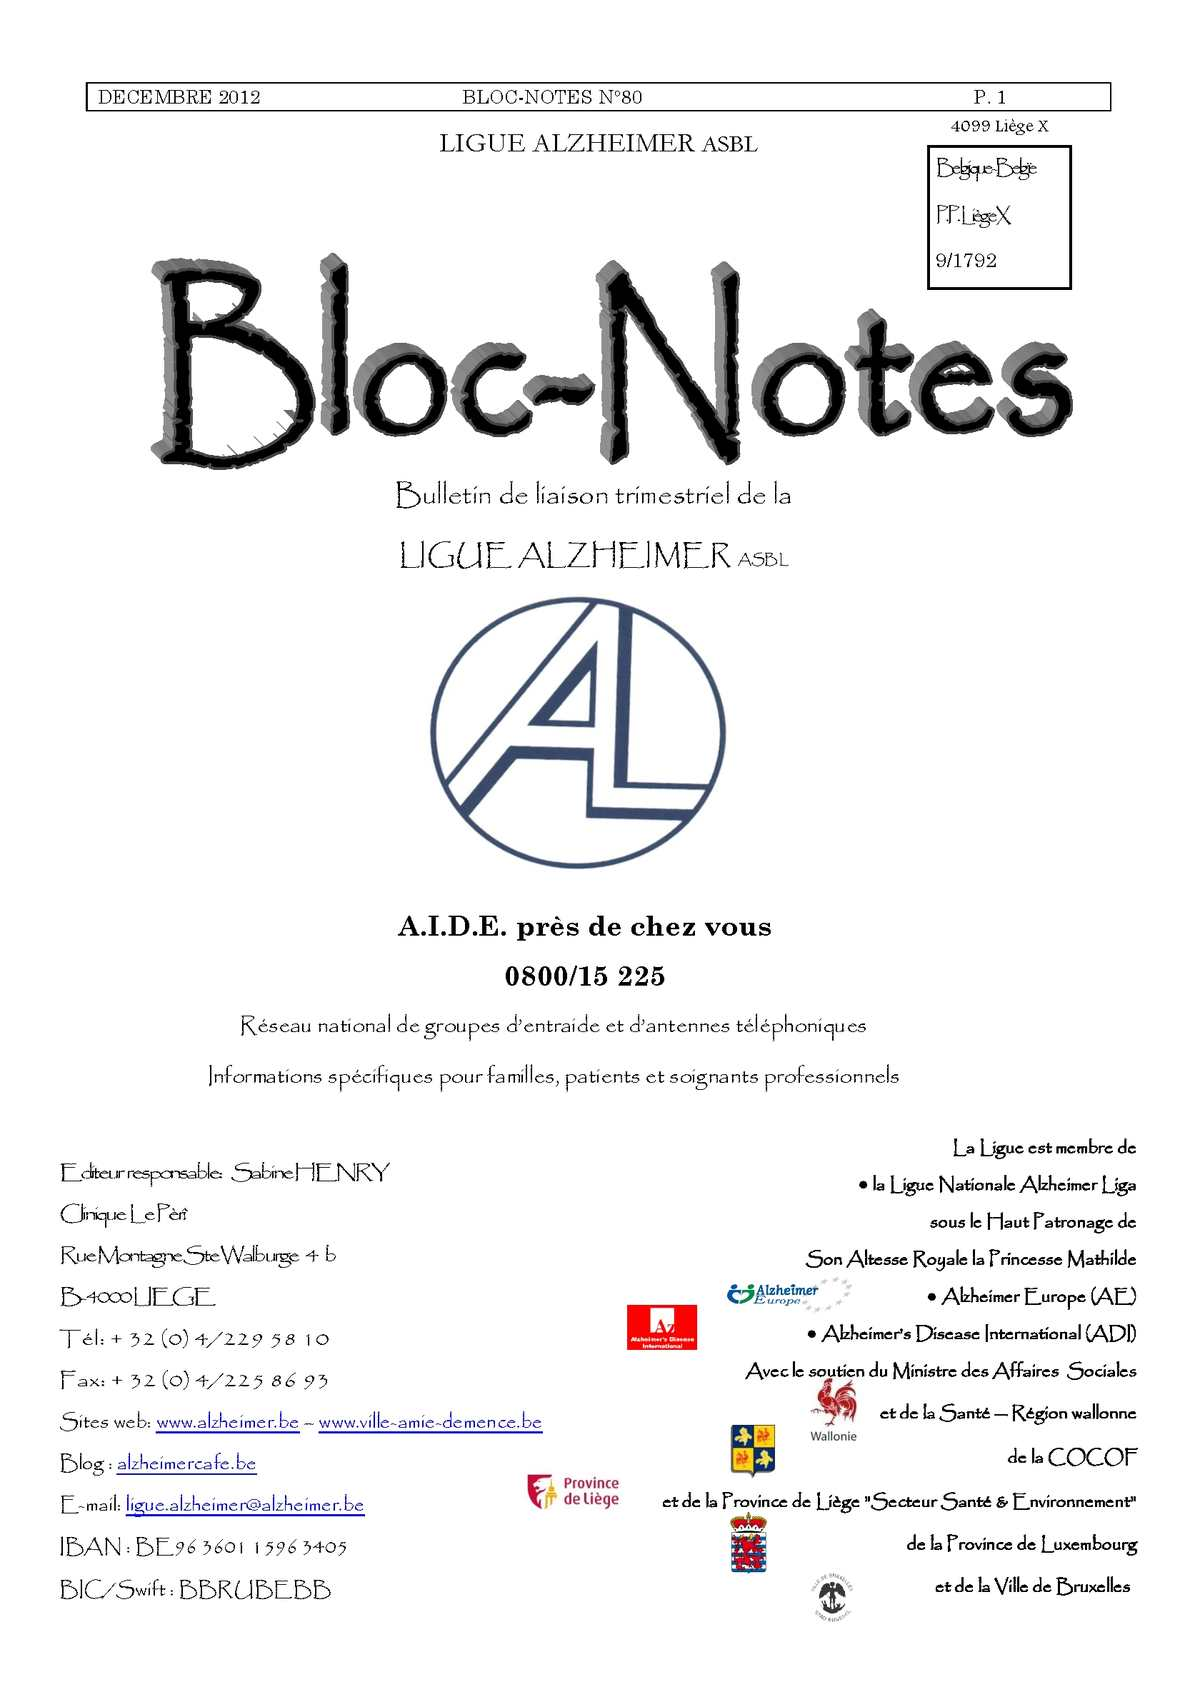 Carte Europeenne Dassurance Maladie Omnimut.Calameo Bloc Notes 80